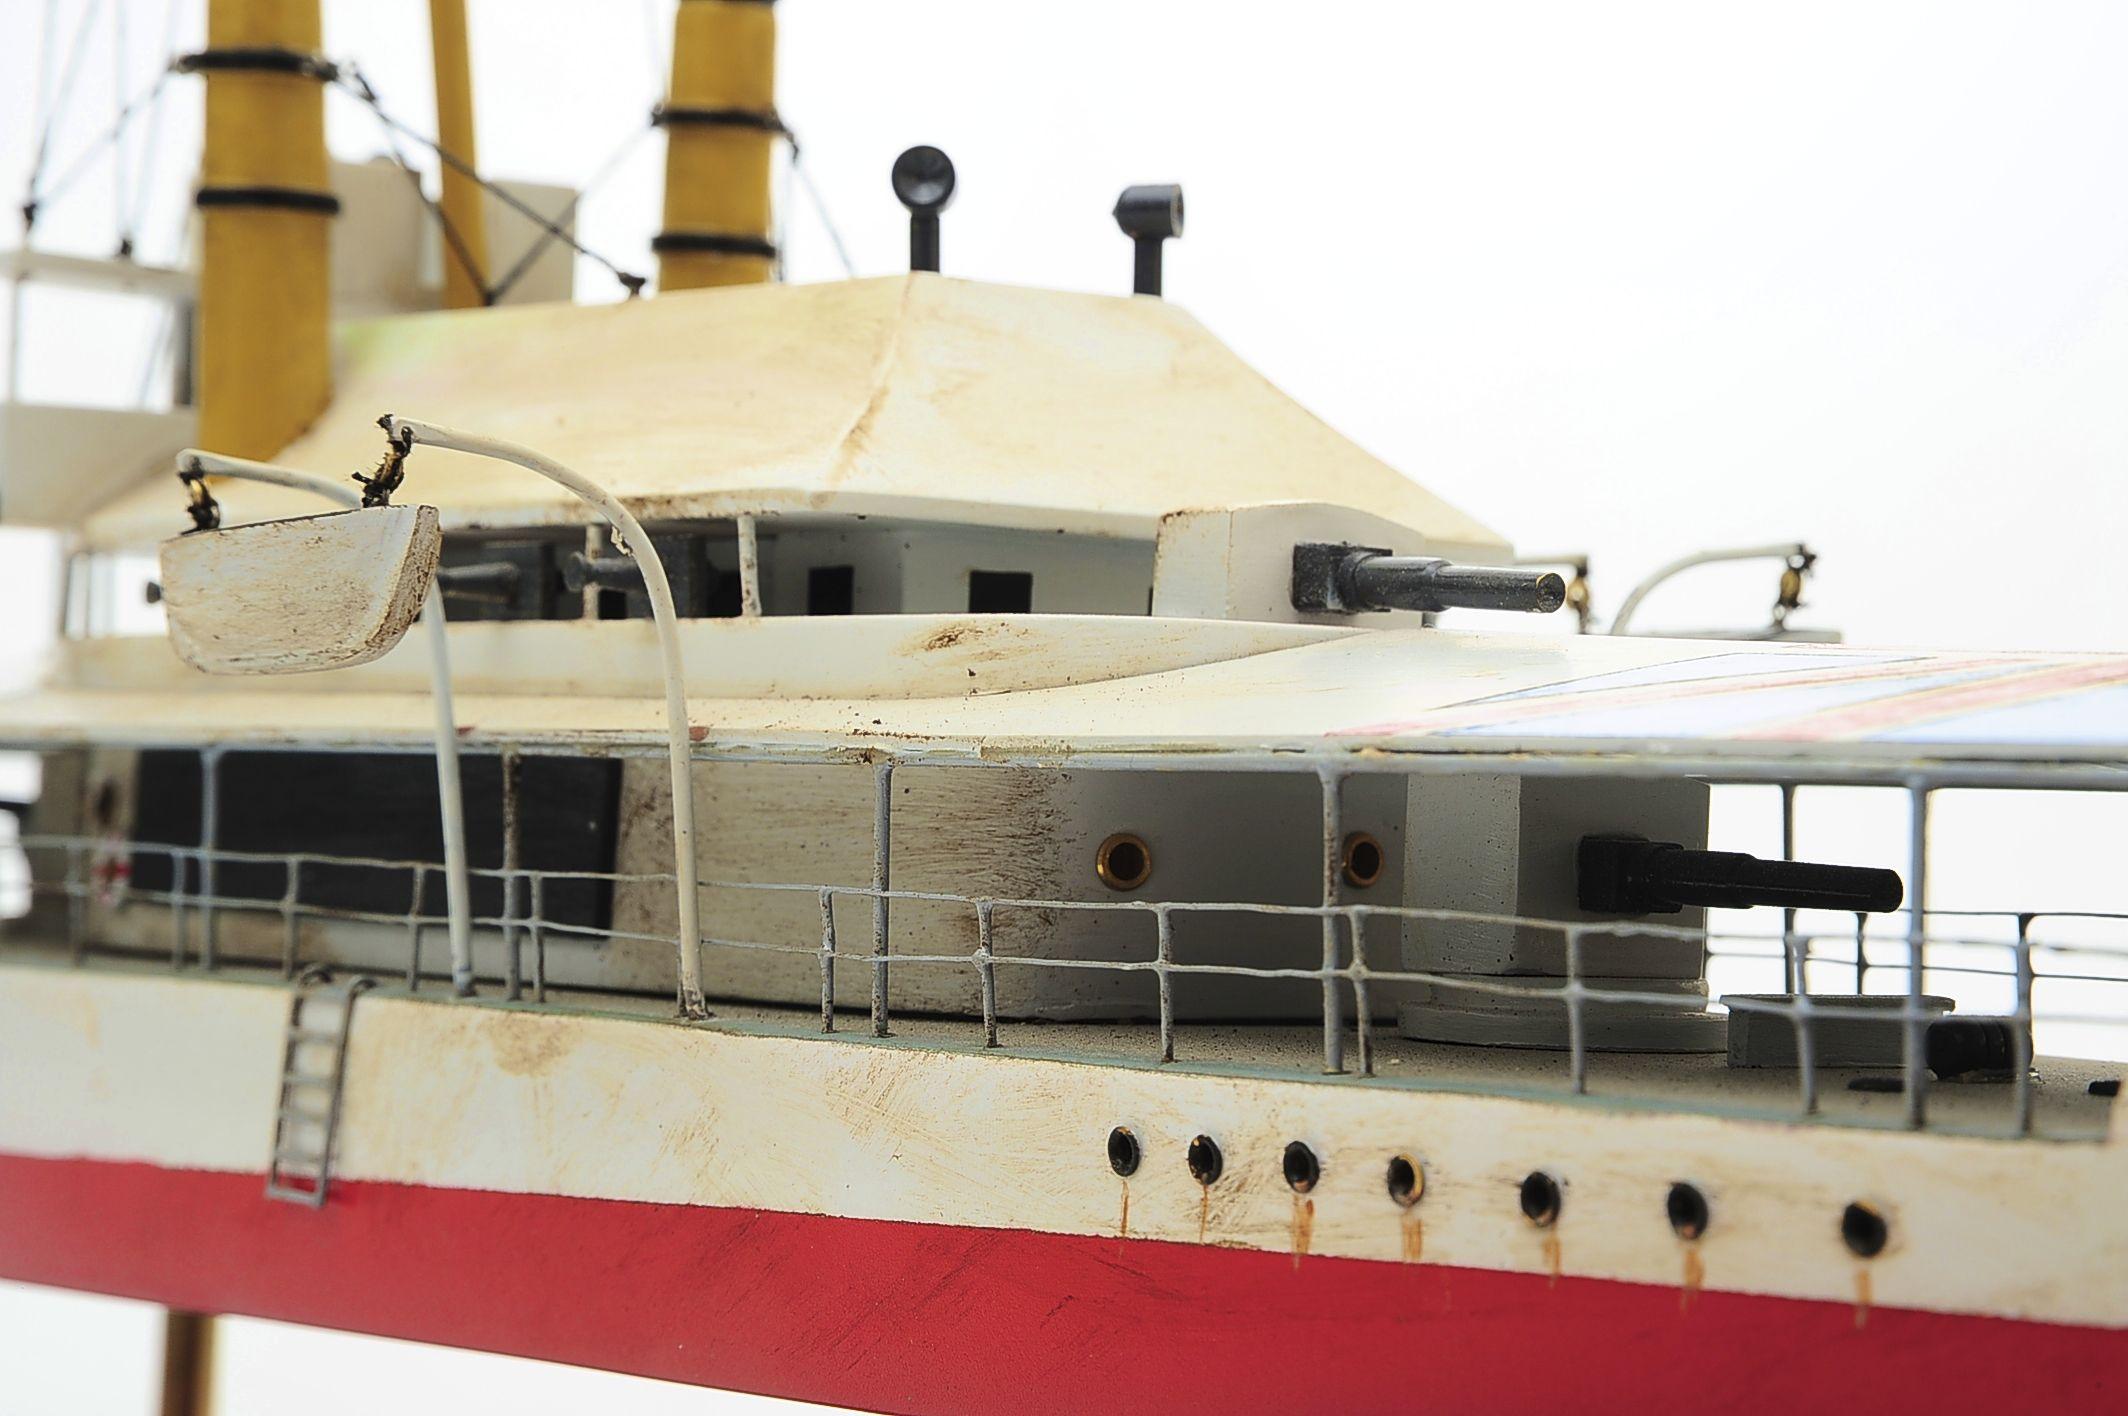 1392-6186-HMS-Cockchafer-Premier-Range